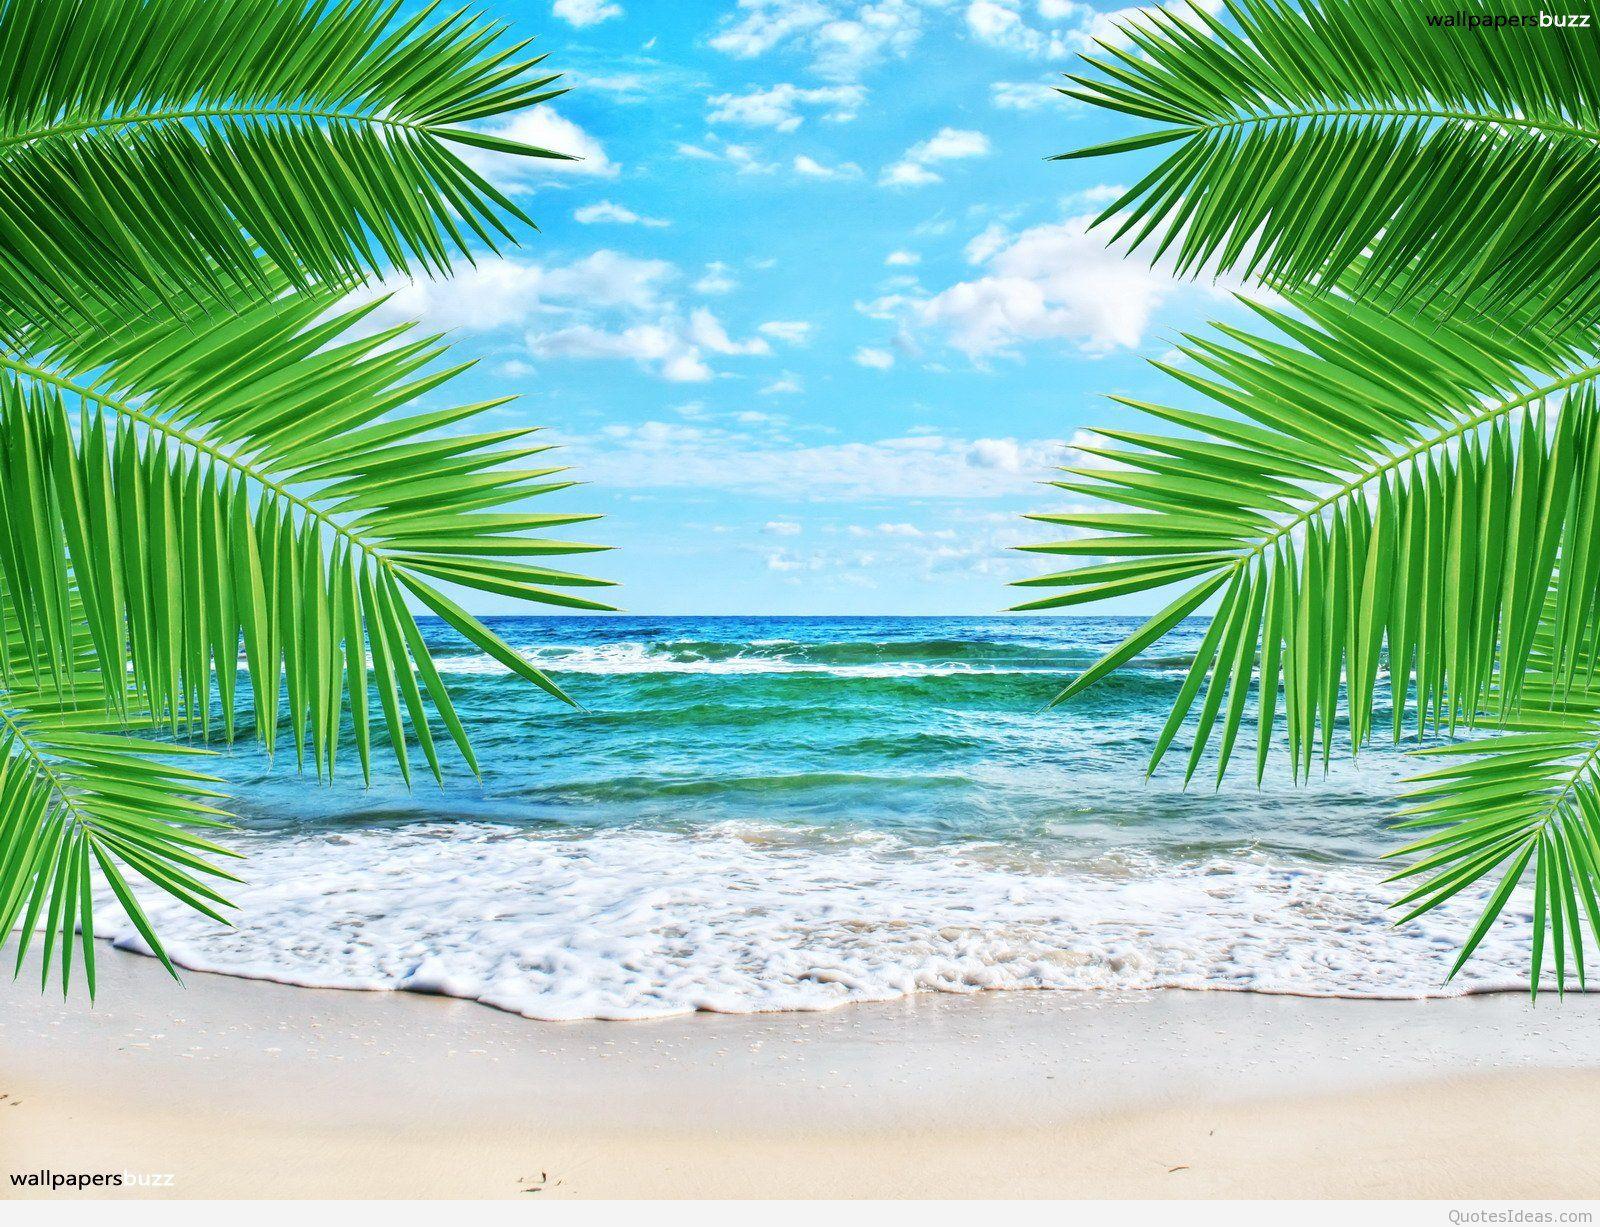 Summer Beach Wallpaper High Resolution Tropical Beach Background 1600x1227 Wallpaper Teahub Io